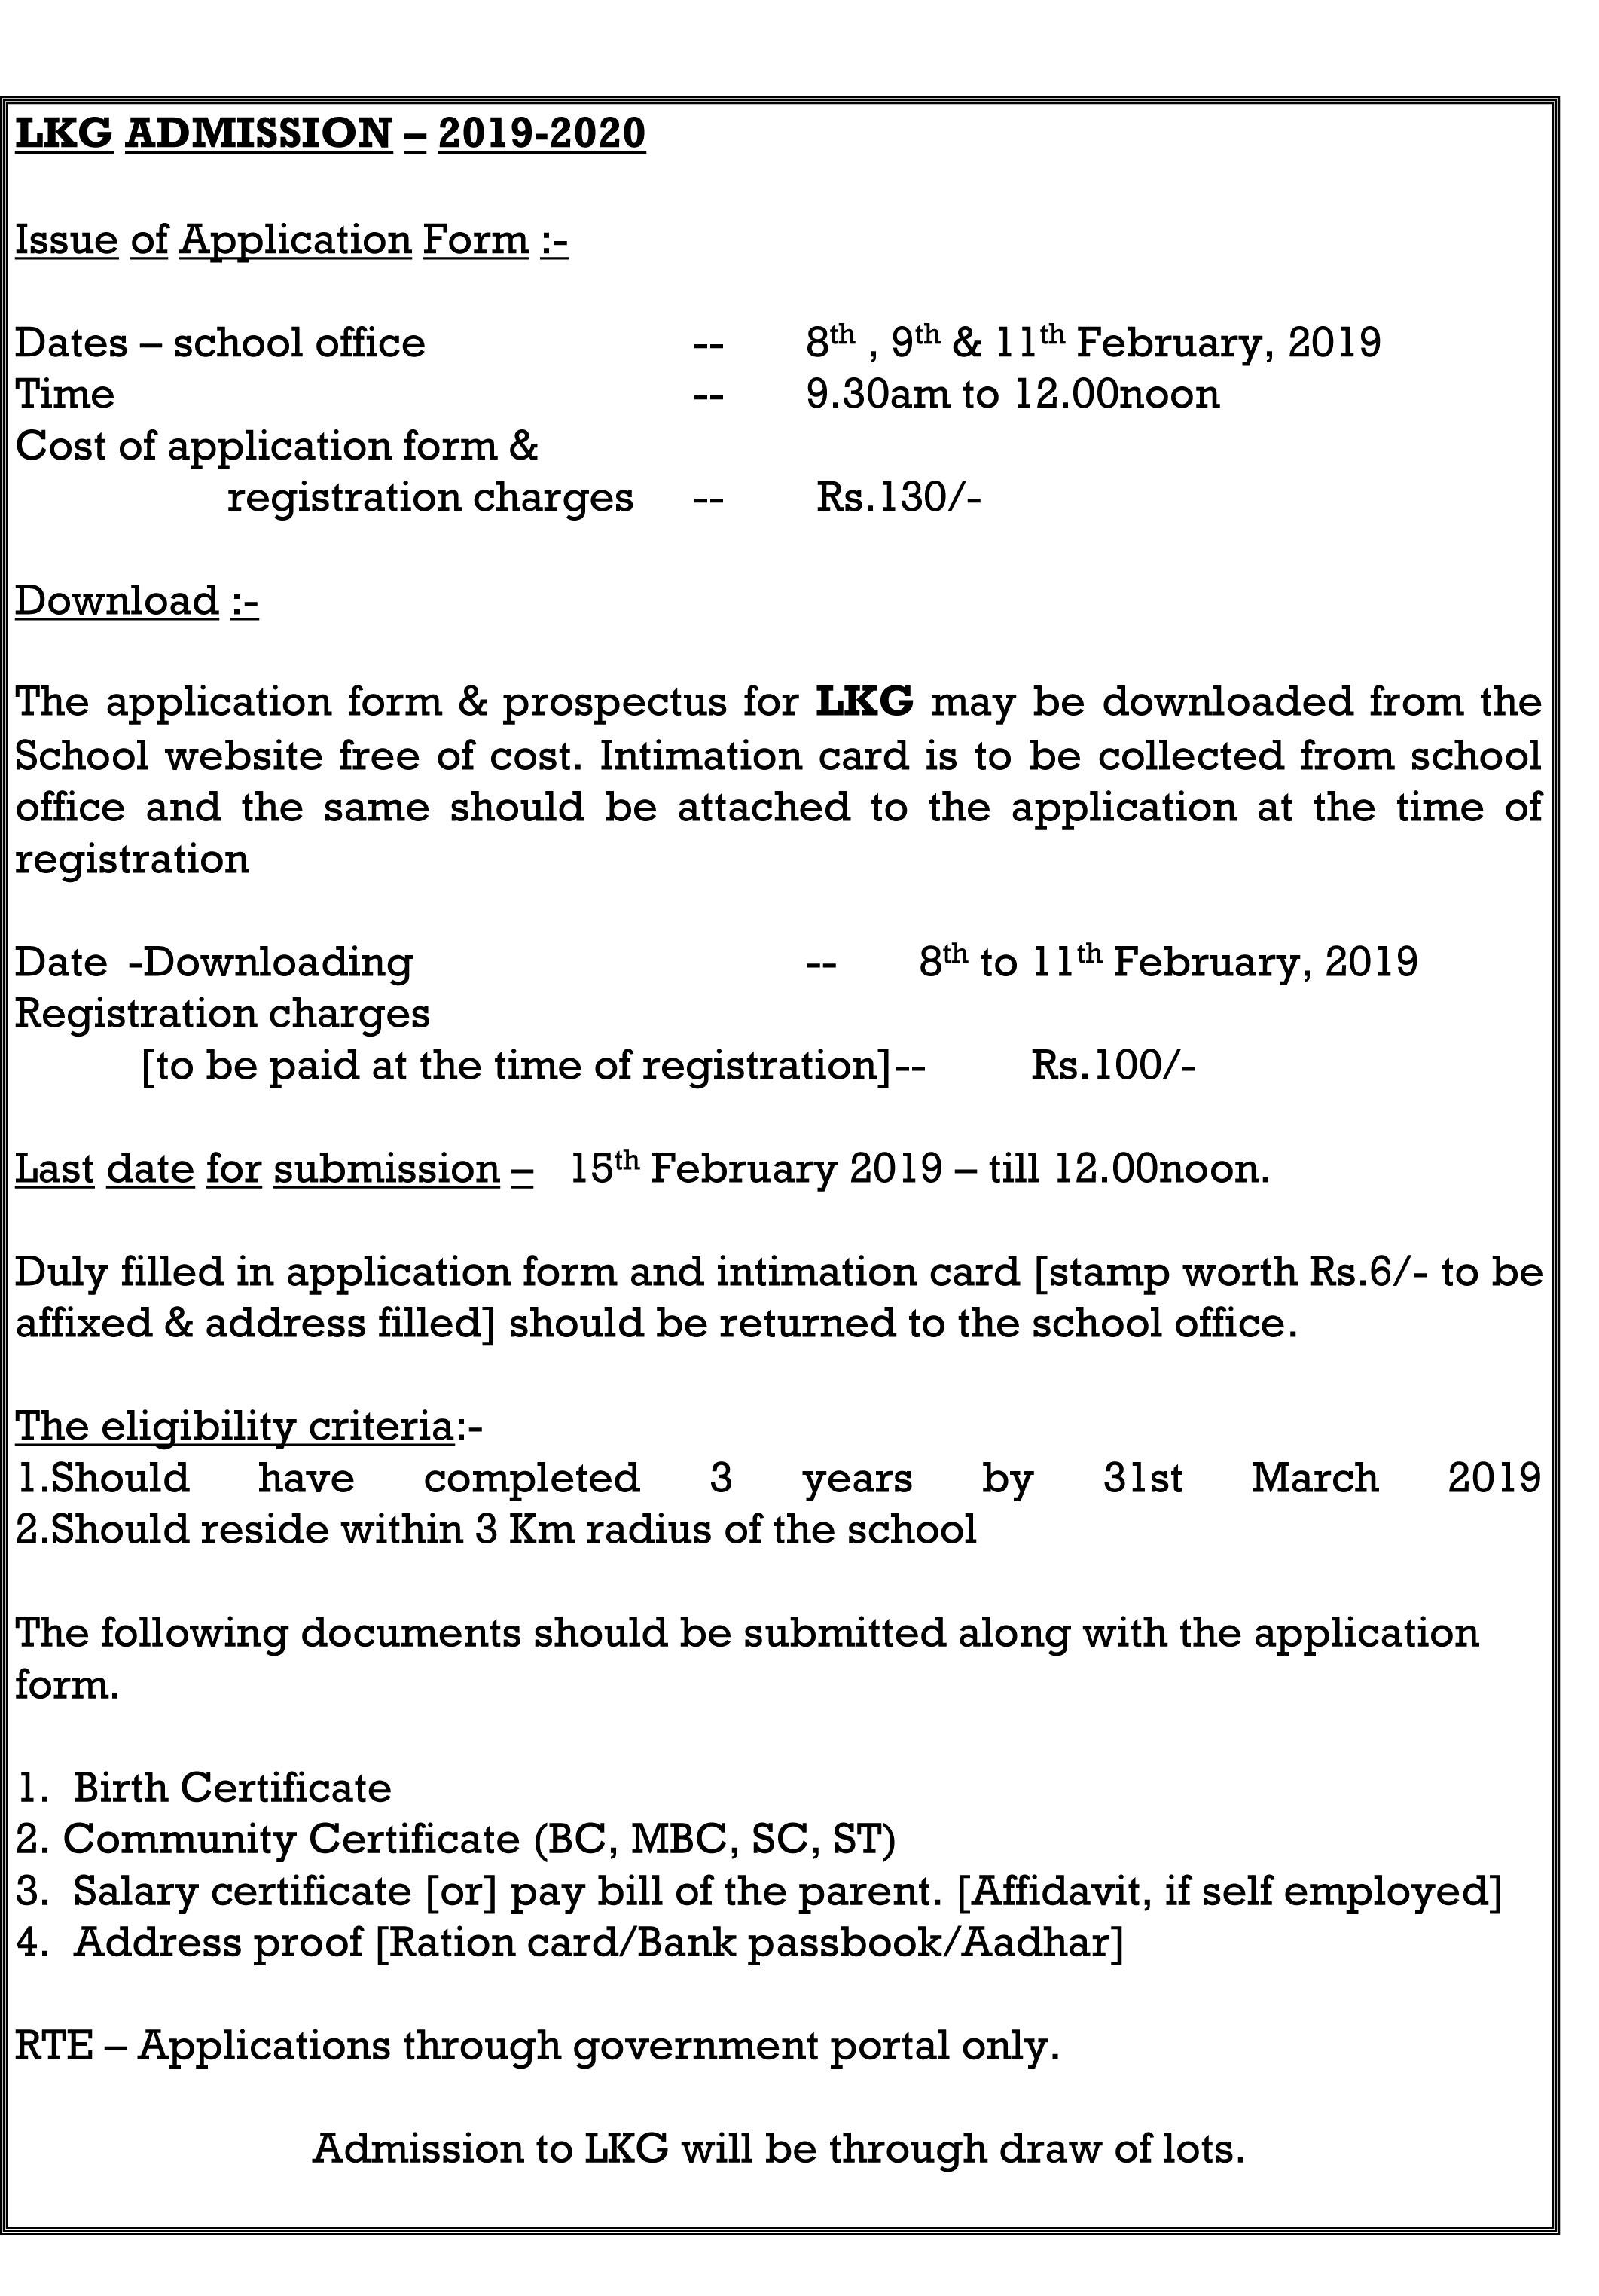 LKG Admission Notification – 2019-2020